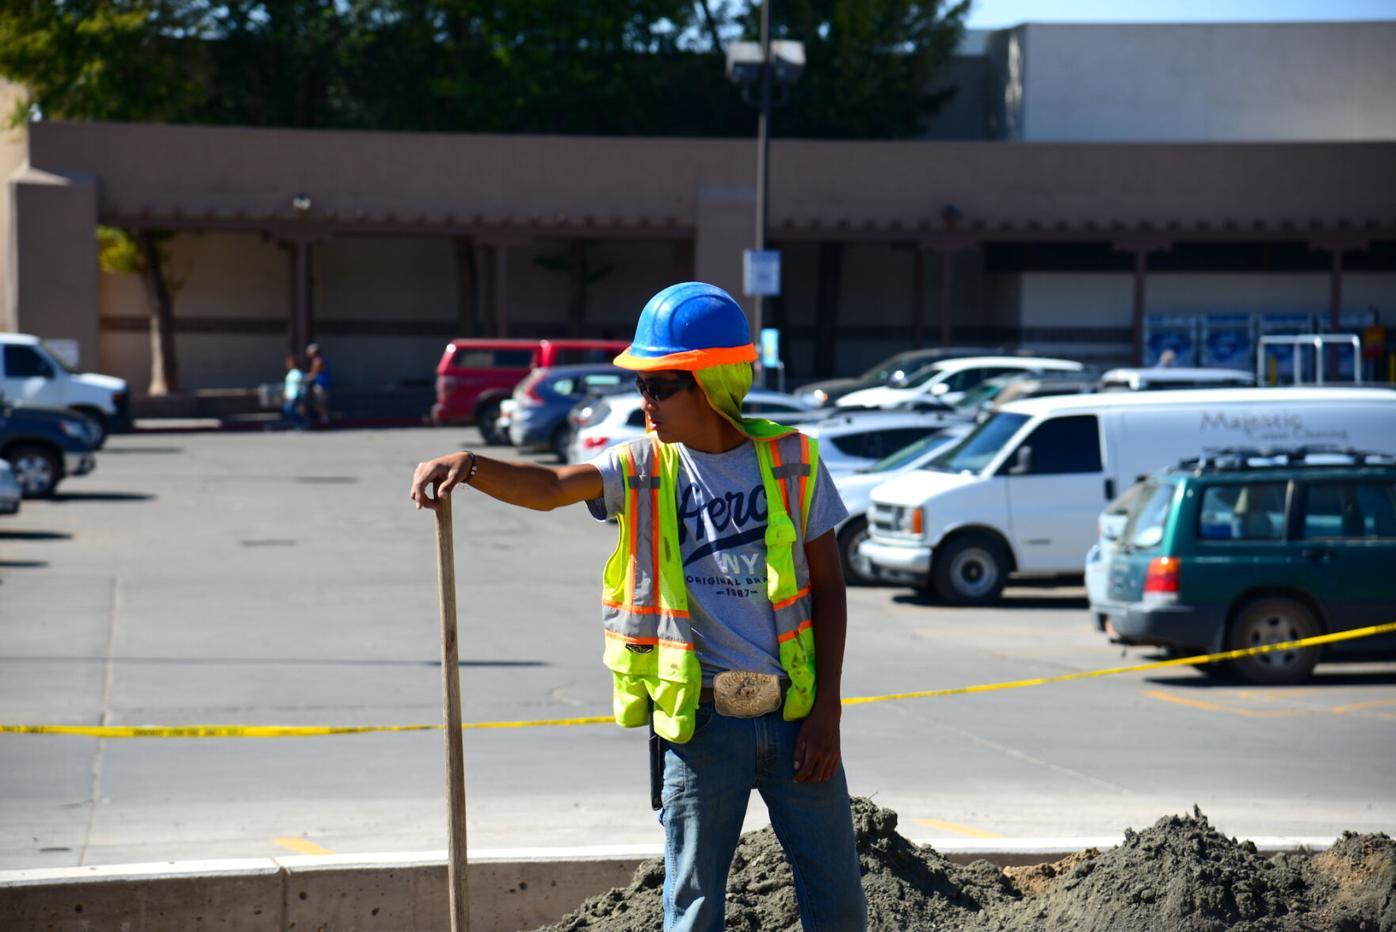 Paseo construction 9-17-21 - 2